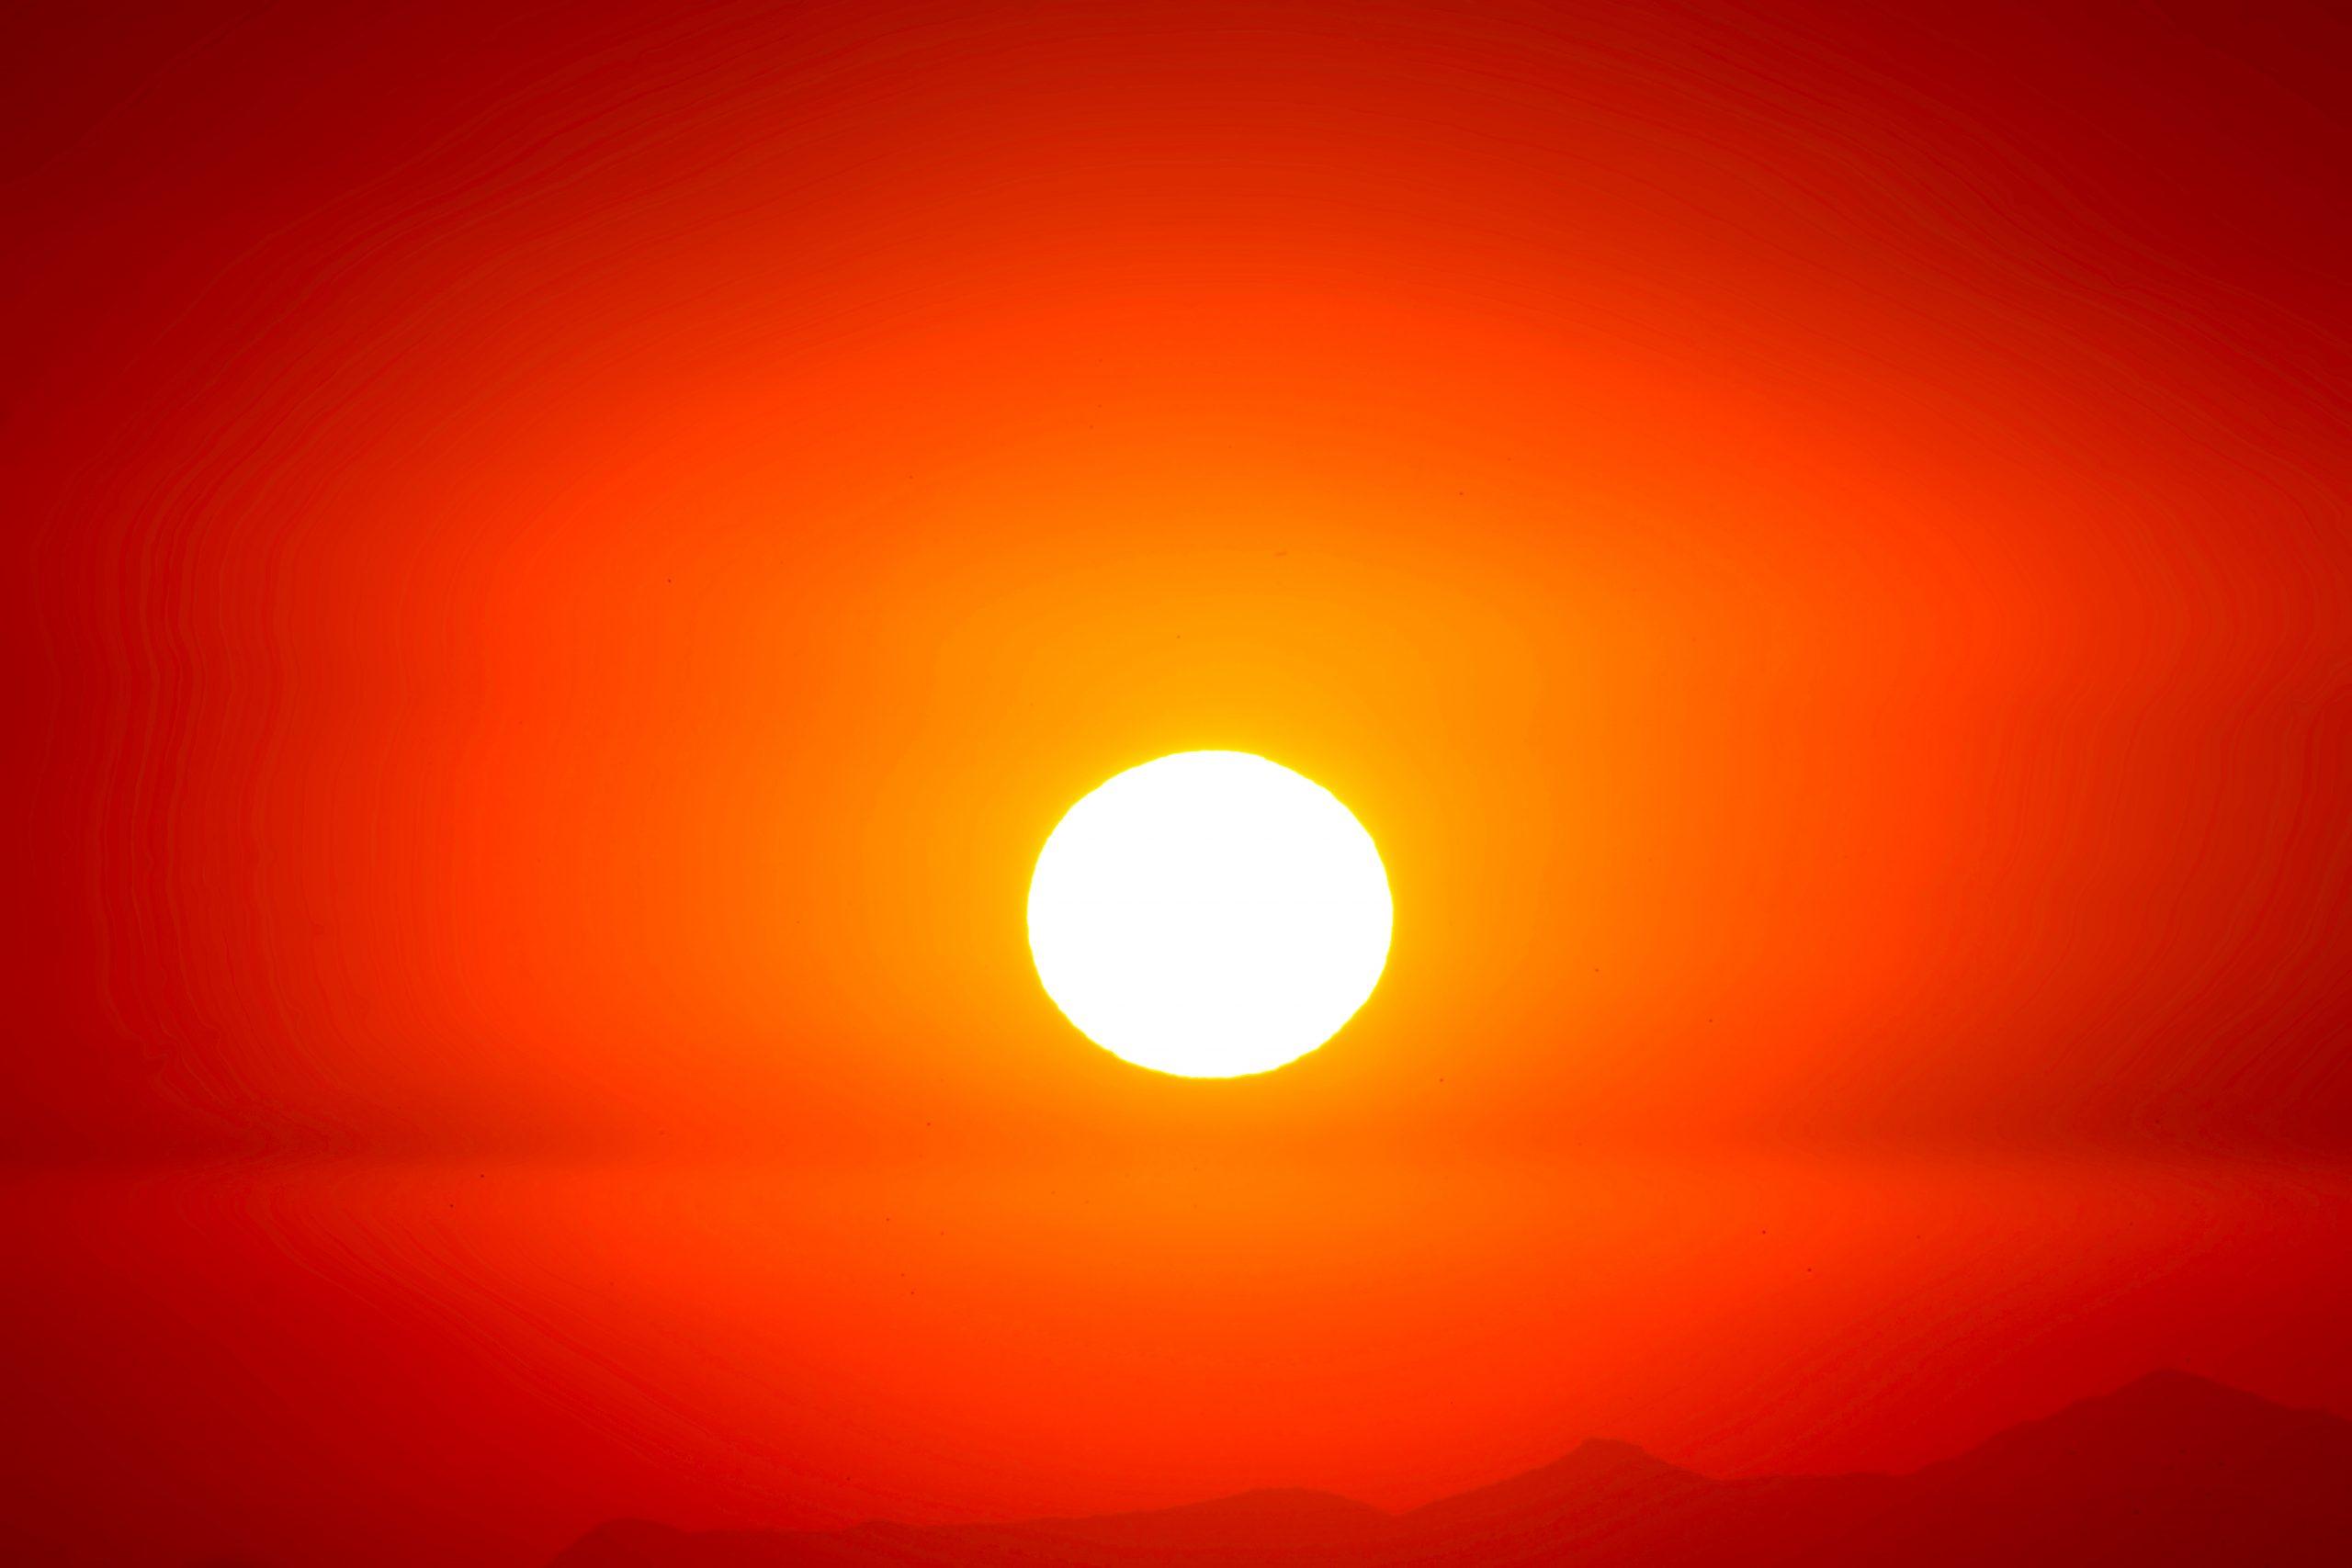 Cahaya Matahari Akan Mati, Apa yang Terjadi Dengan Bumi?